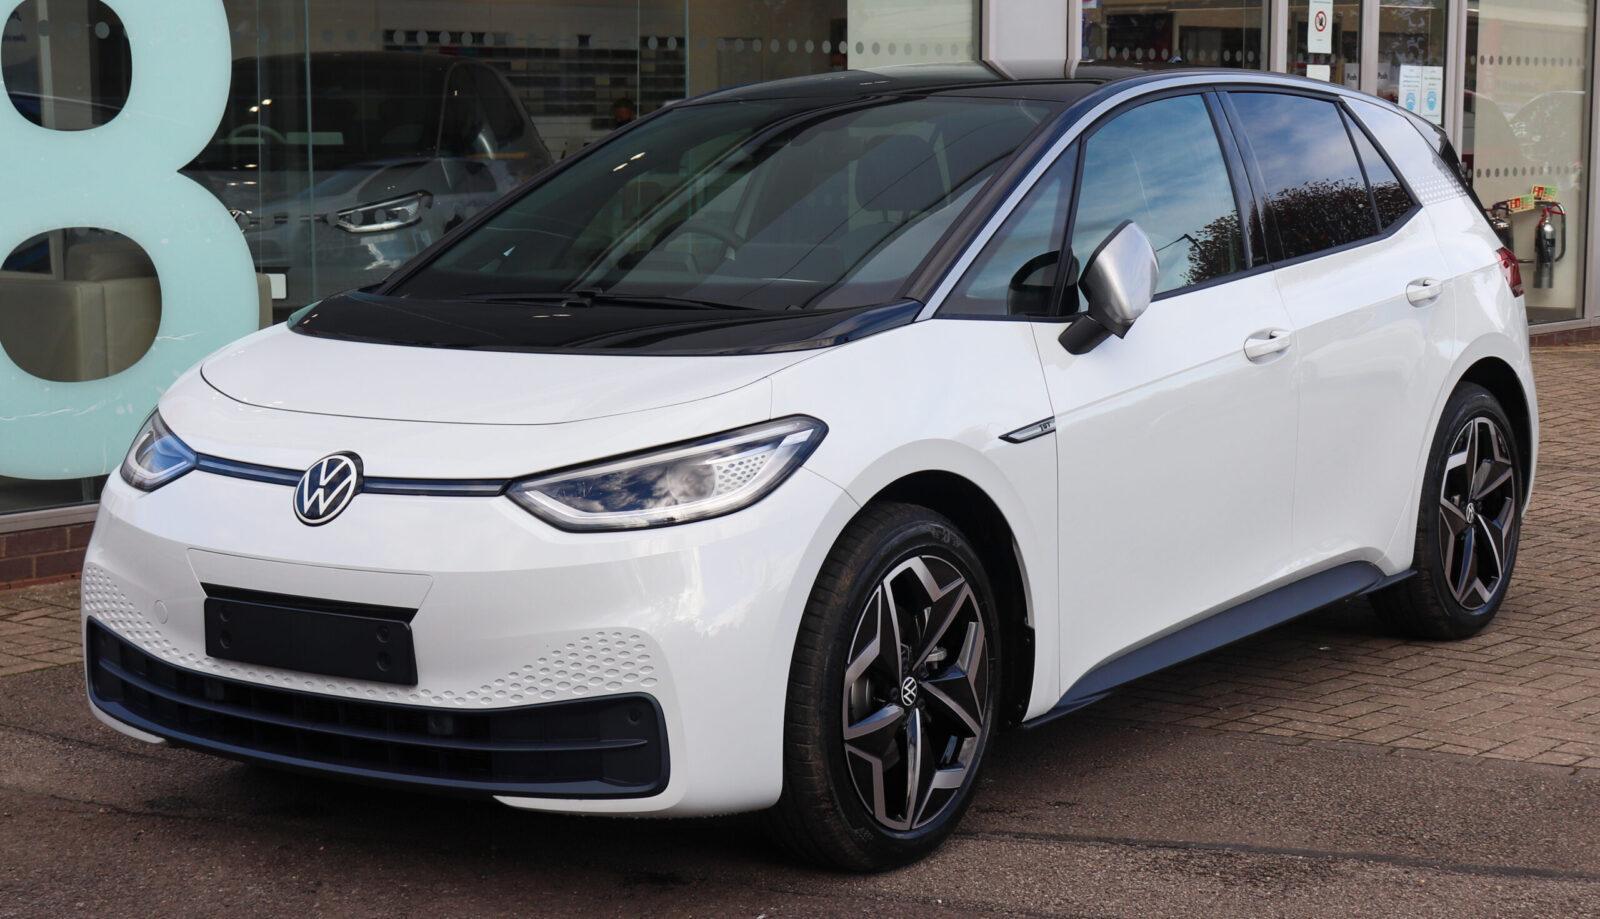 Бестселлер Volkswagen ID.3: за первый год марка привлекла около 70 000 новых клиентов (2020 Volkswagen ID.3 1st Front scaled)